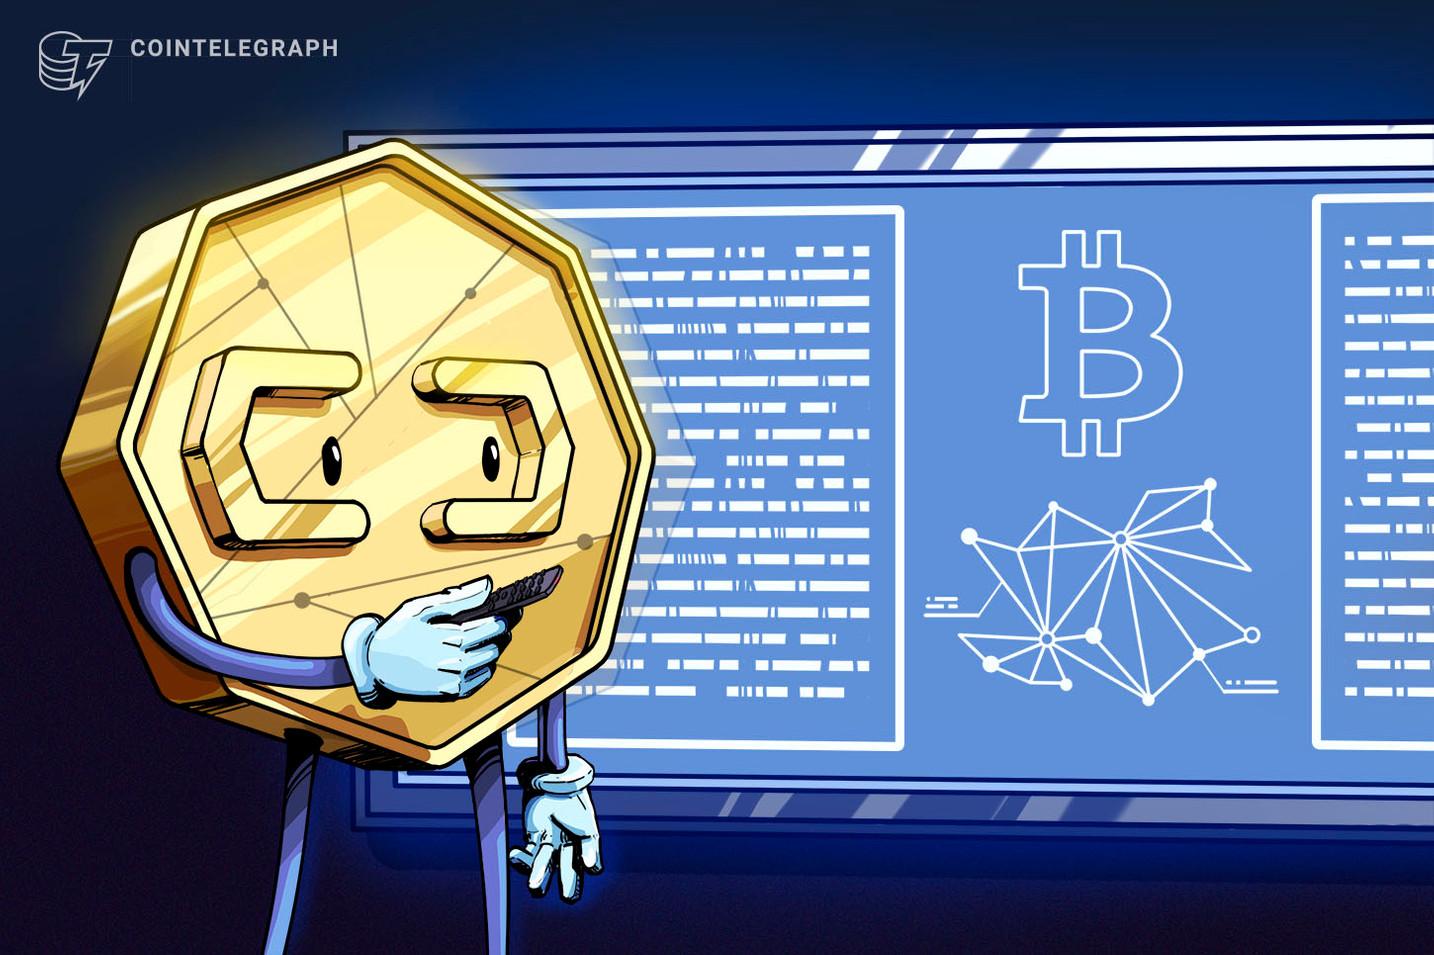 Bitcoin-Kurs bleibt über 7.100 US-Dollar